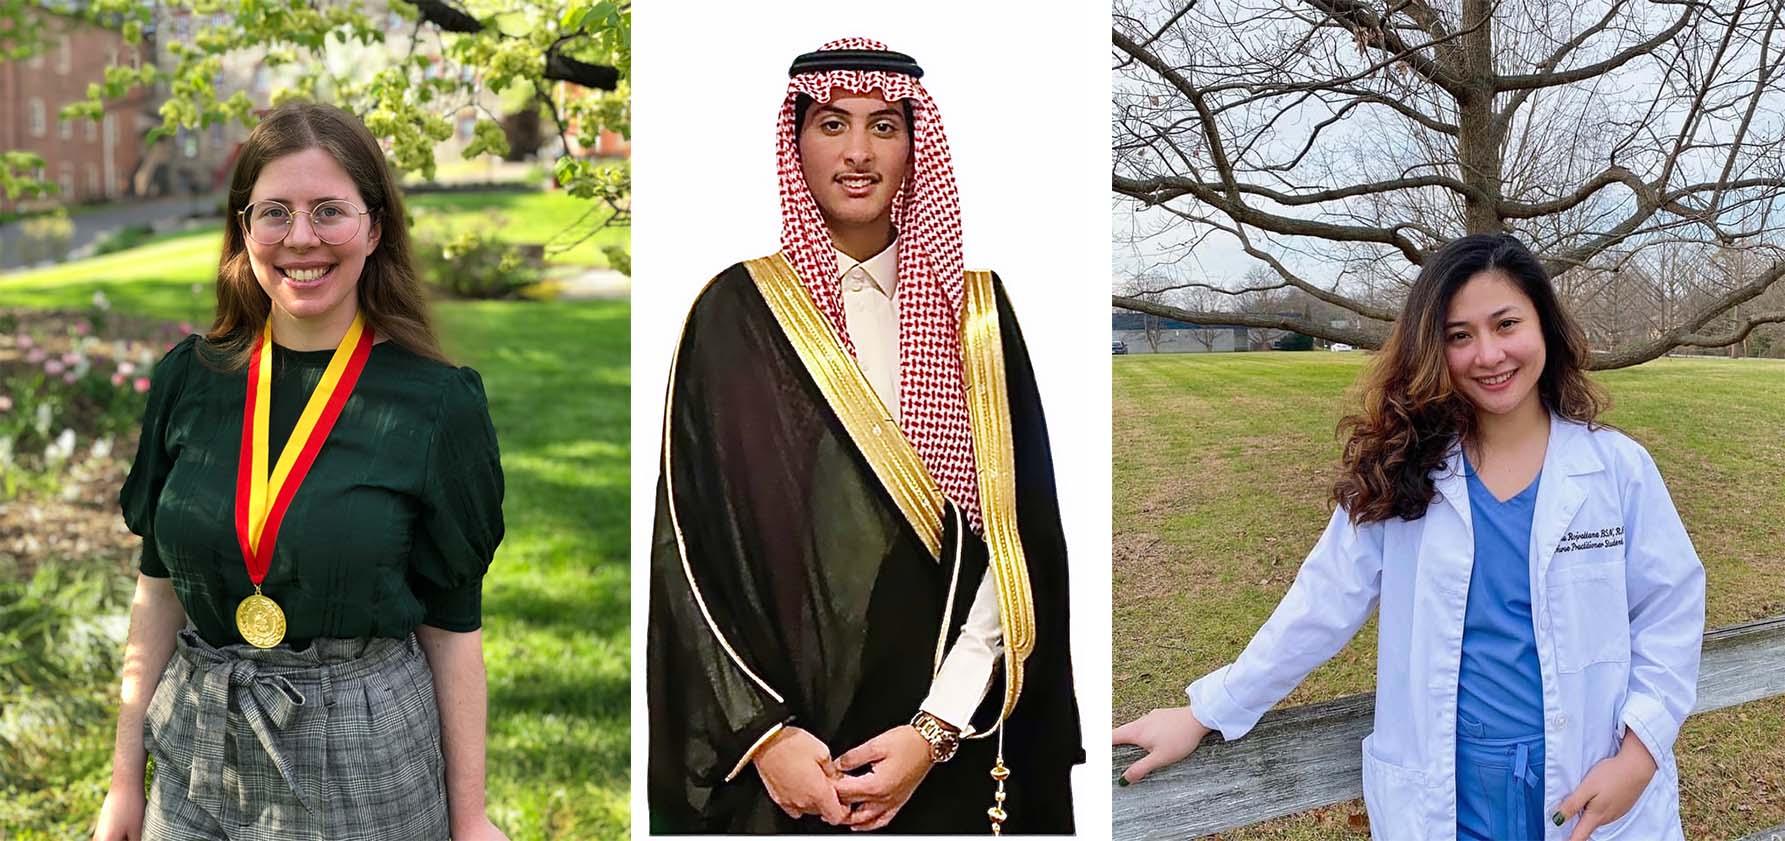 Phi Beta Delta inductees (from left to right): Lara Slabber '21, Turki Mohammed Alrashidi '22, and Natcha Rojrattana '17, G'21.